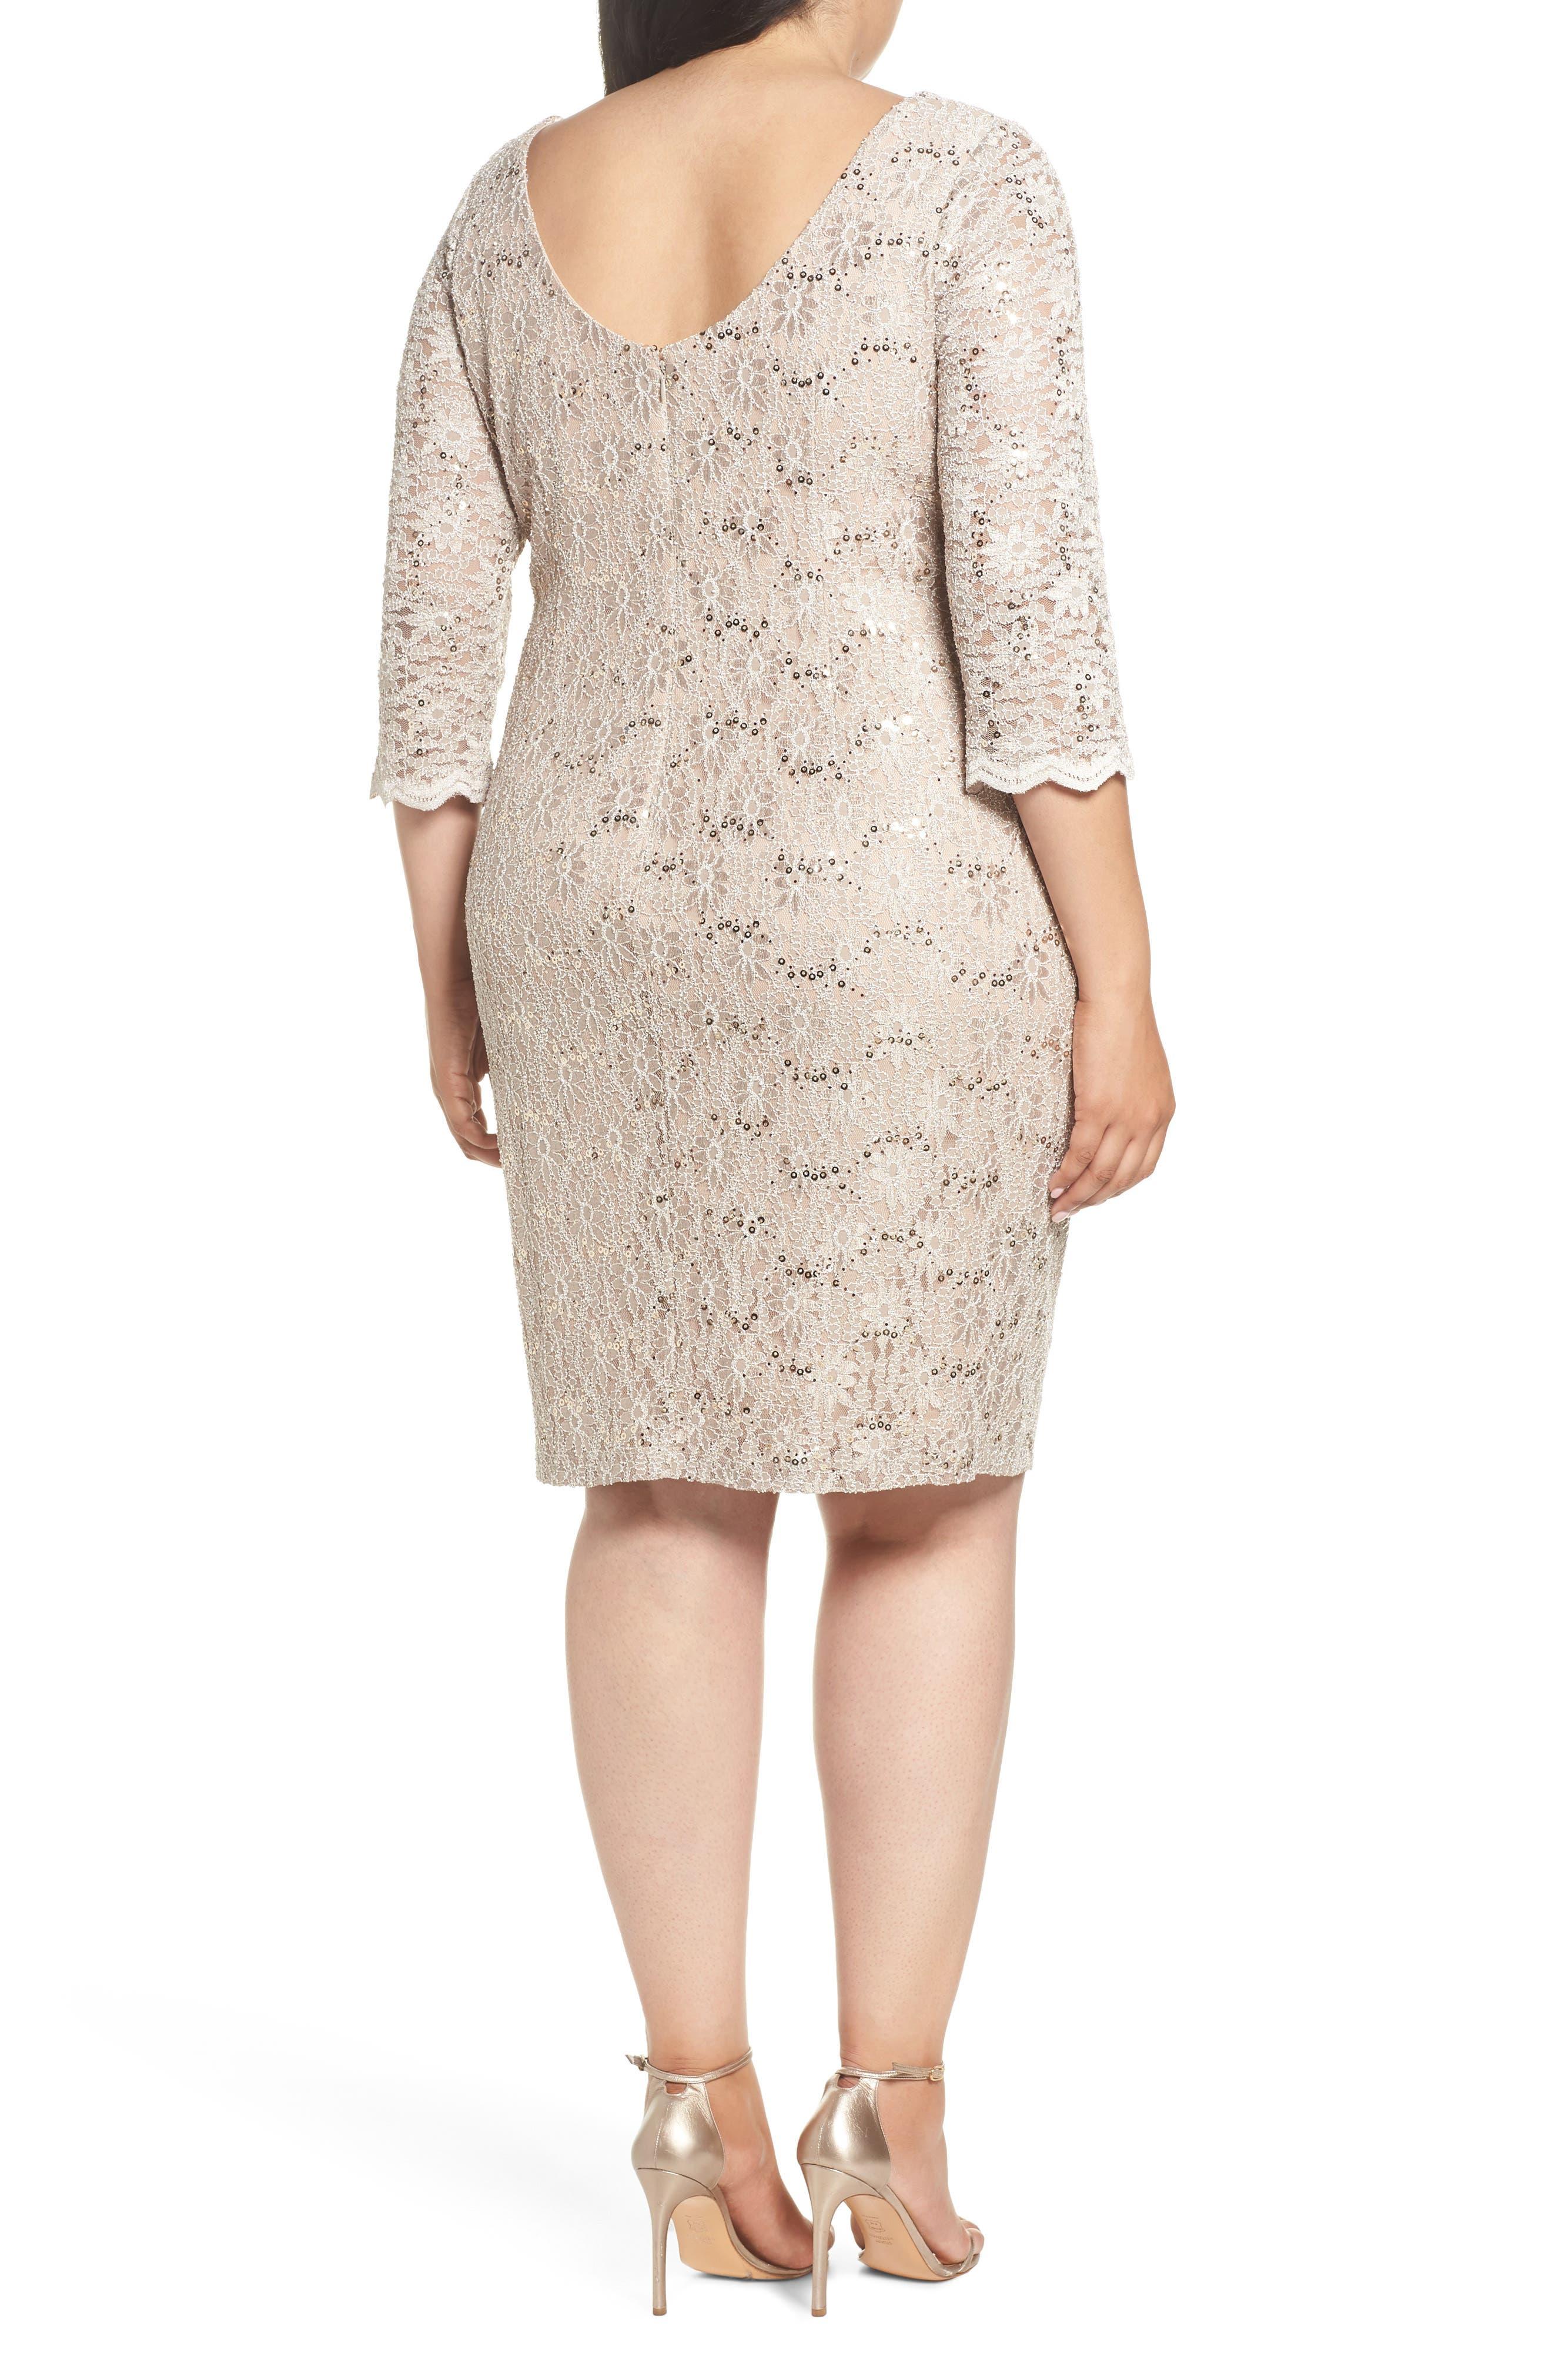 Embellished Illusion Lace Shift Dress,                             Alternate thumbnail 2, color,                             250